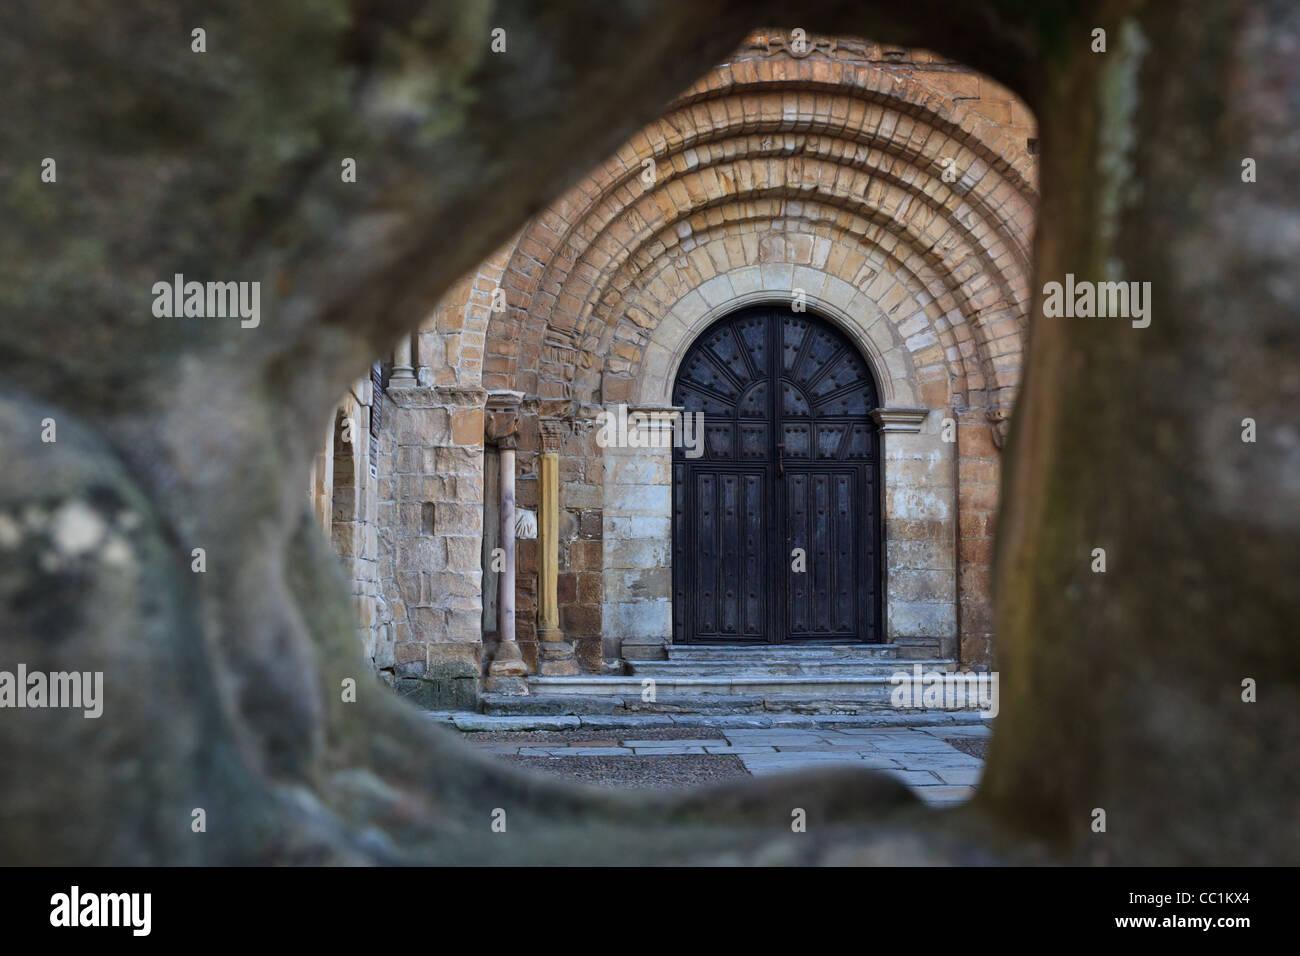 A glimpse of the main entrance to Colegiata, Santillana del Mar, Cantabria, Spain - Stock Image